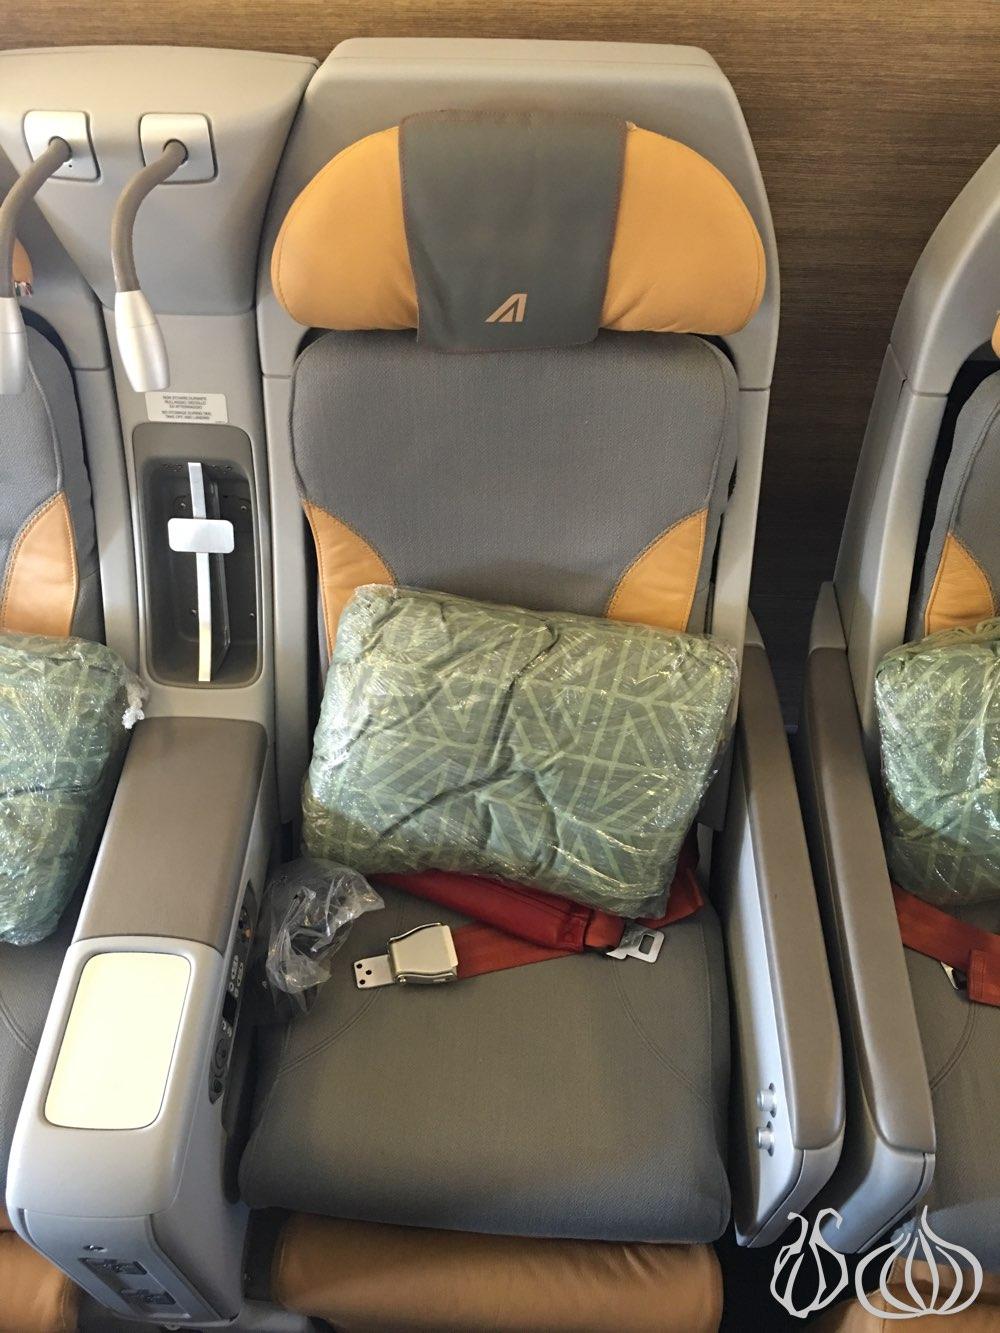 Alitalia Airlines The Premium Economy Cabin